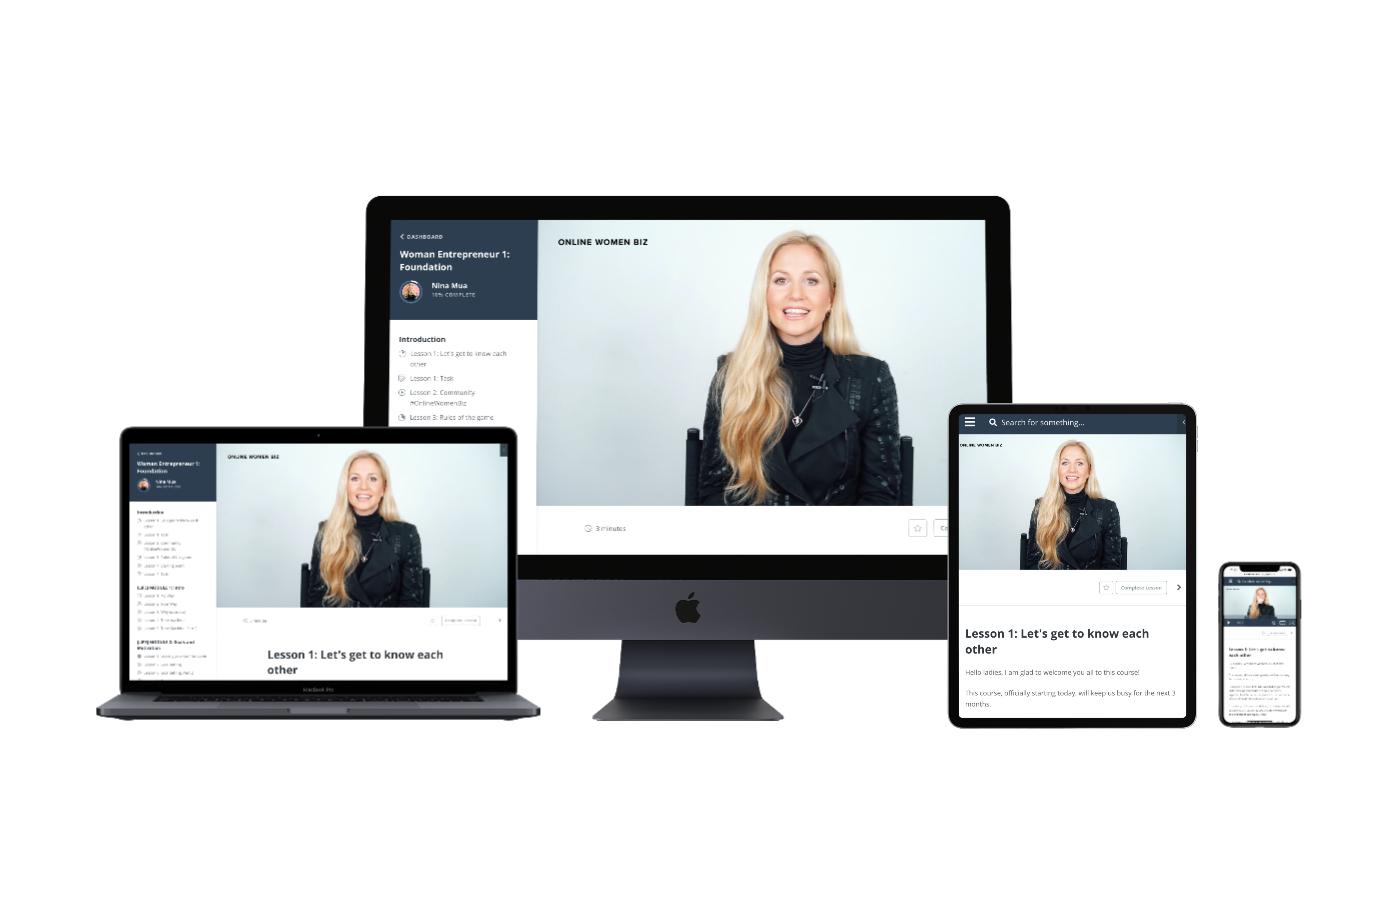 online-women-biz-entrepreneurship-growth.jpeg